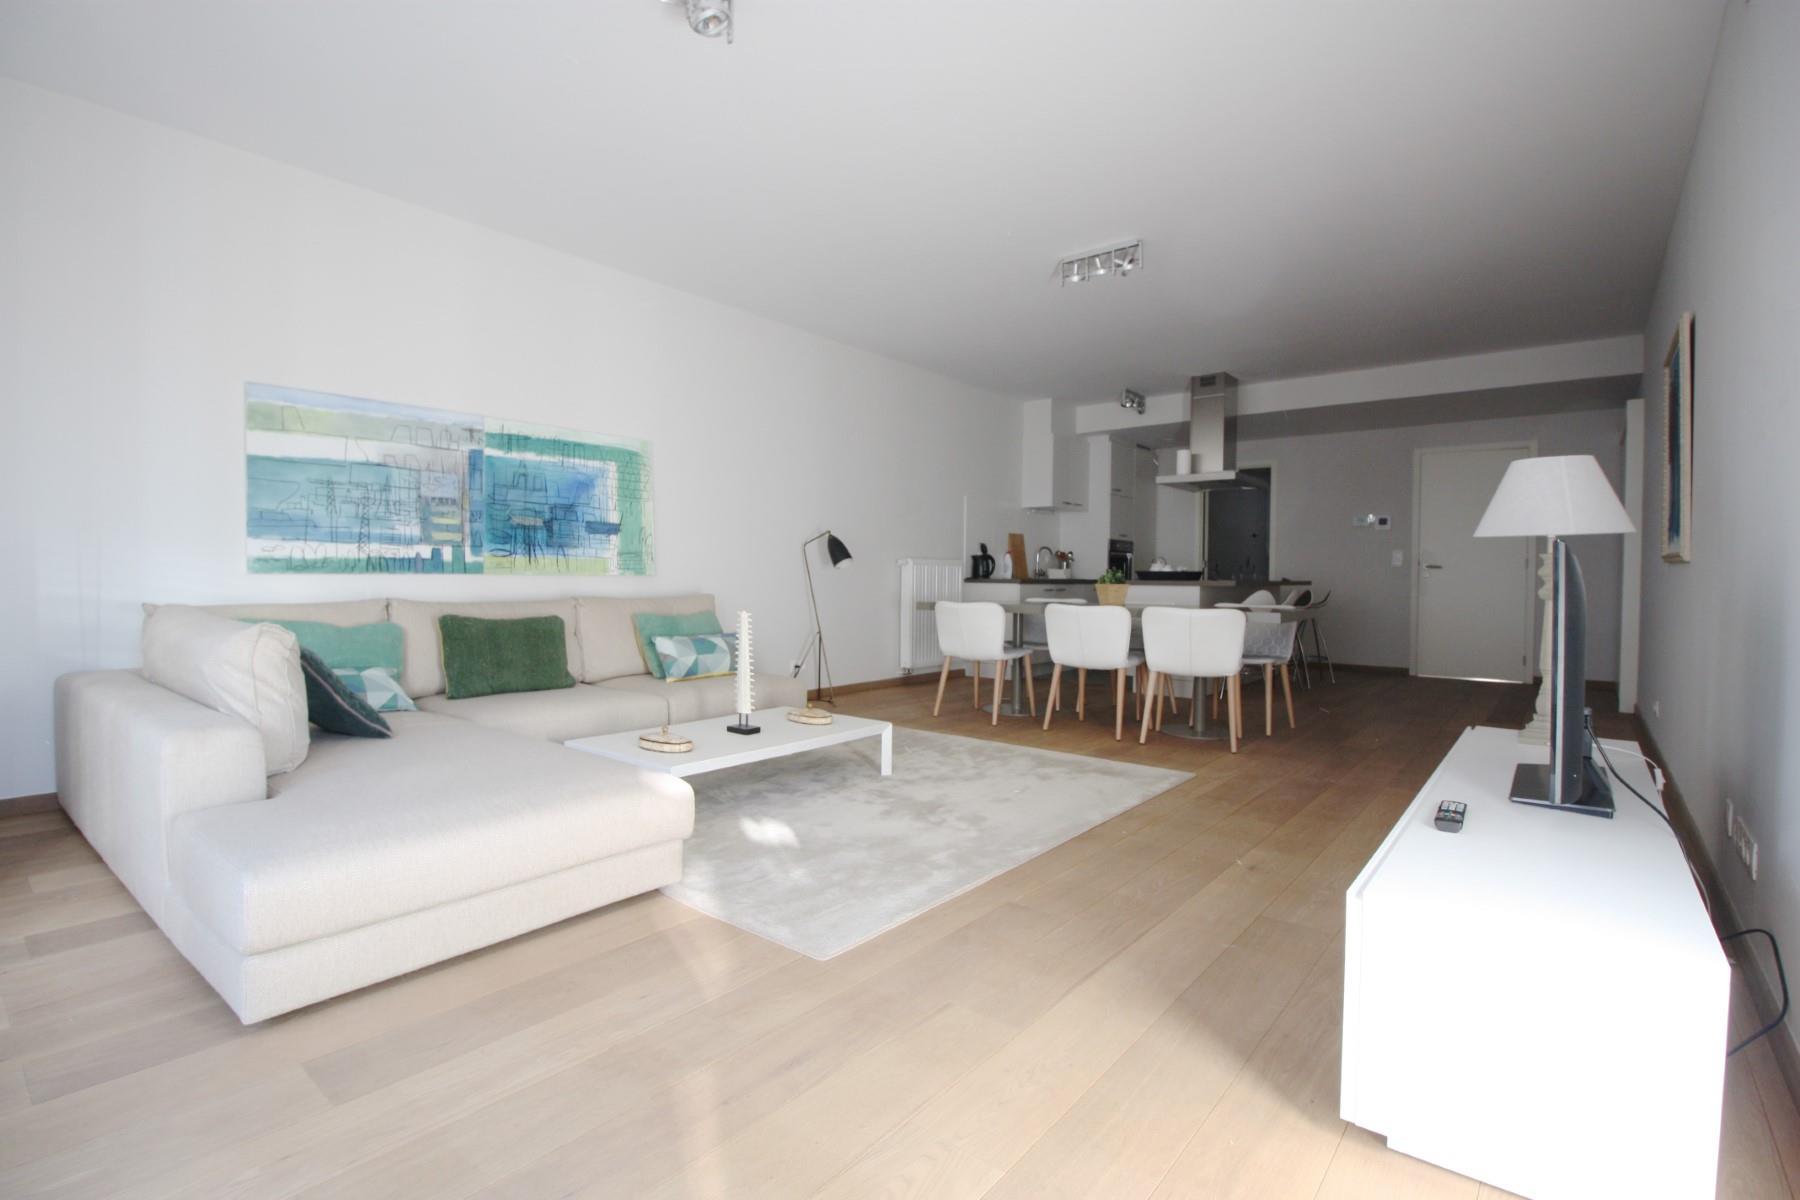 Flat - Etterbeek - #4527457-1